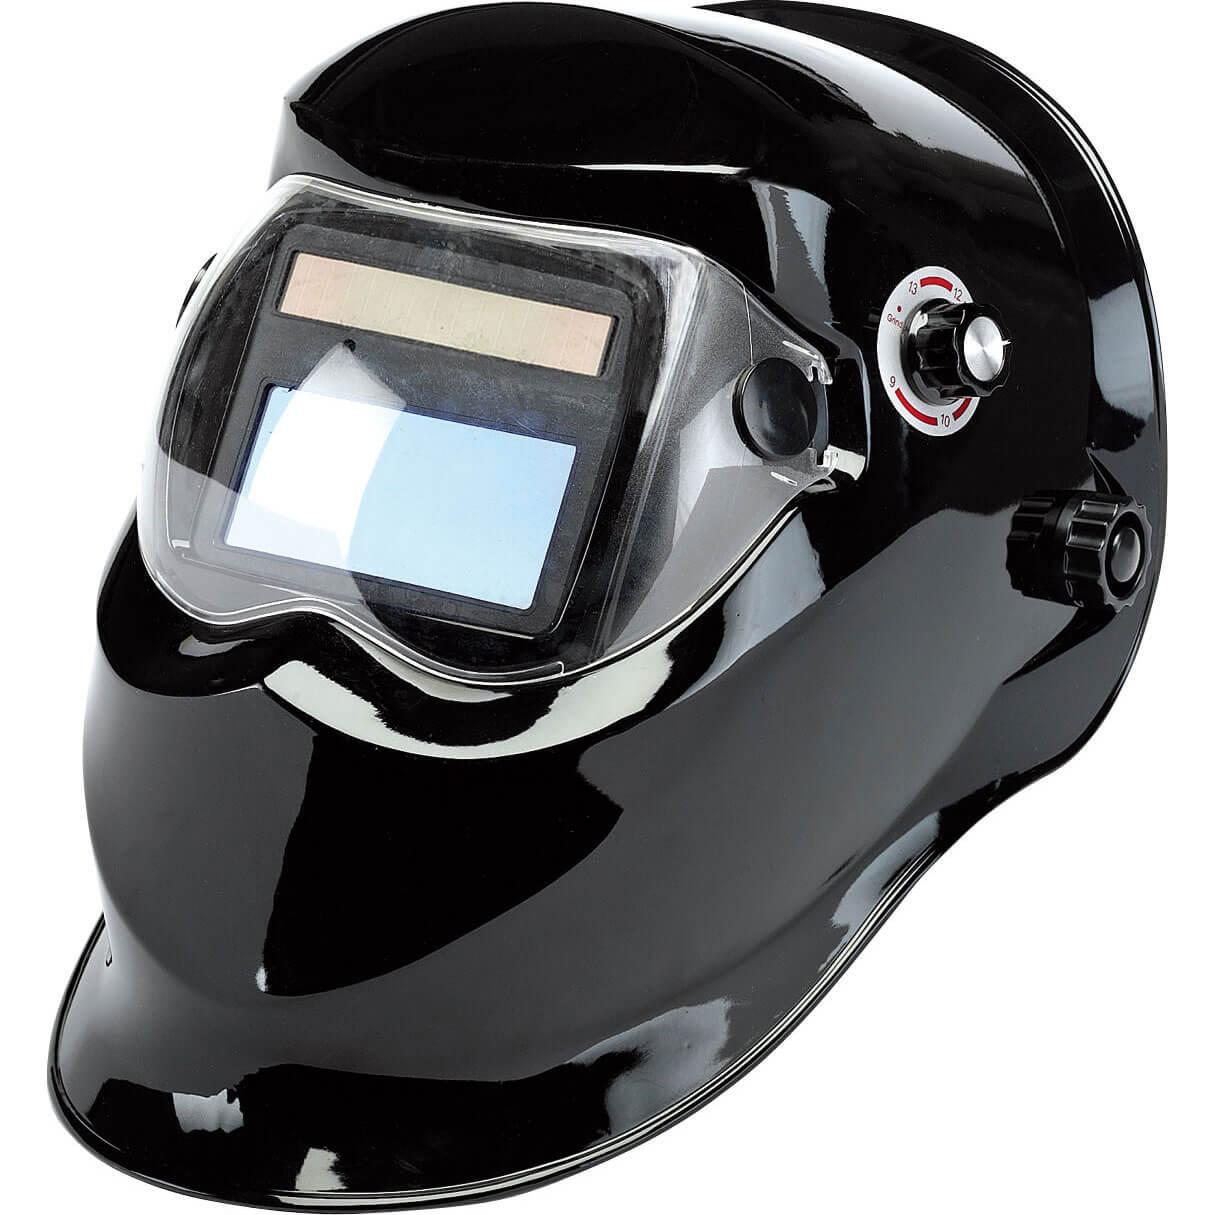 Draper Solar Auto Dimming Vario Shade Welding Helmet Black